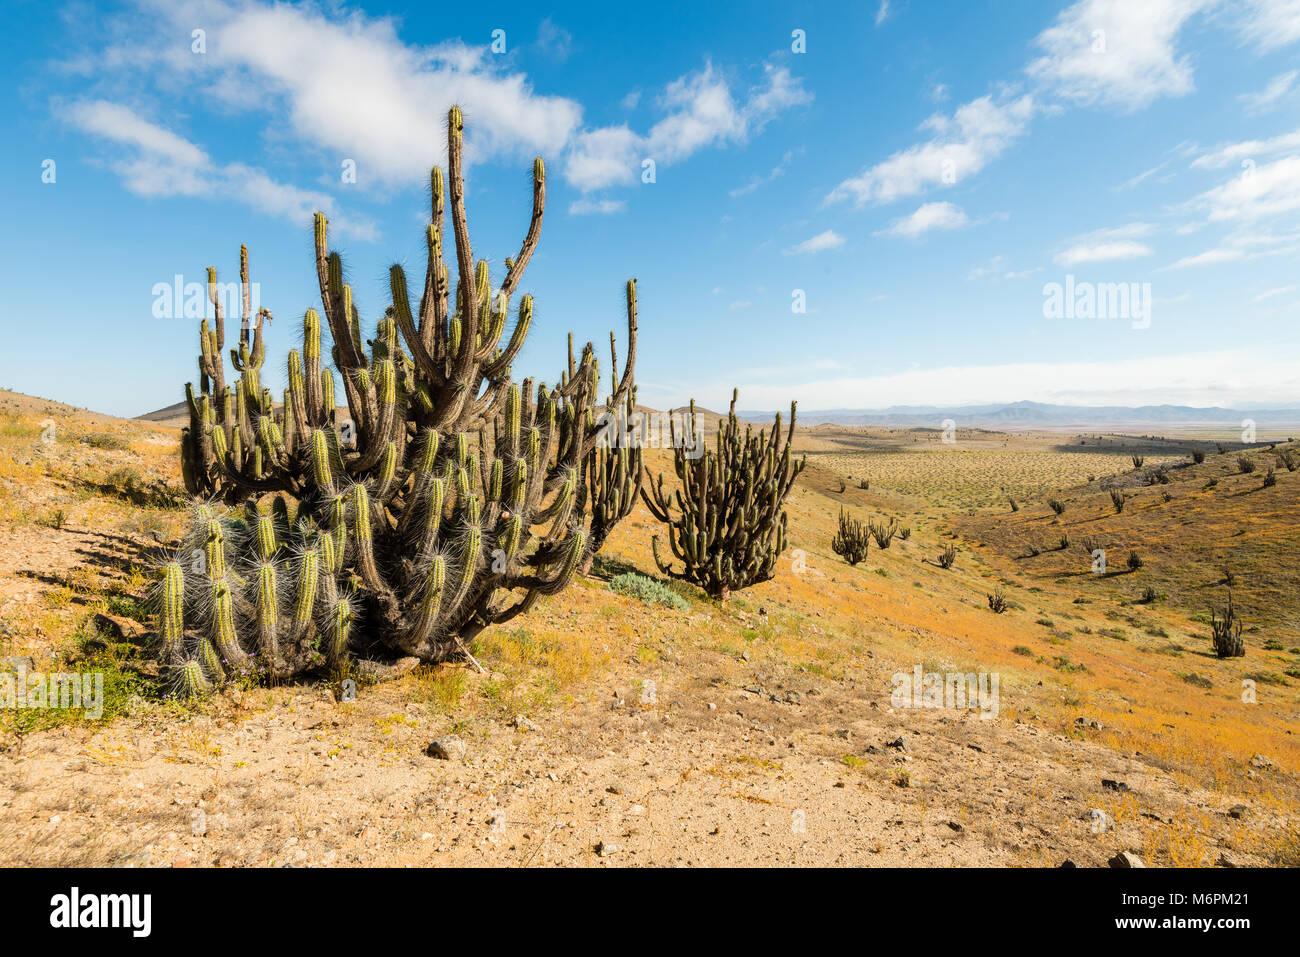 Blooming Desert Chile 2017 - Stock Image